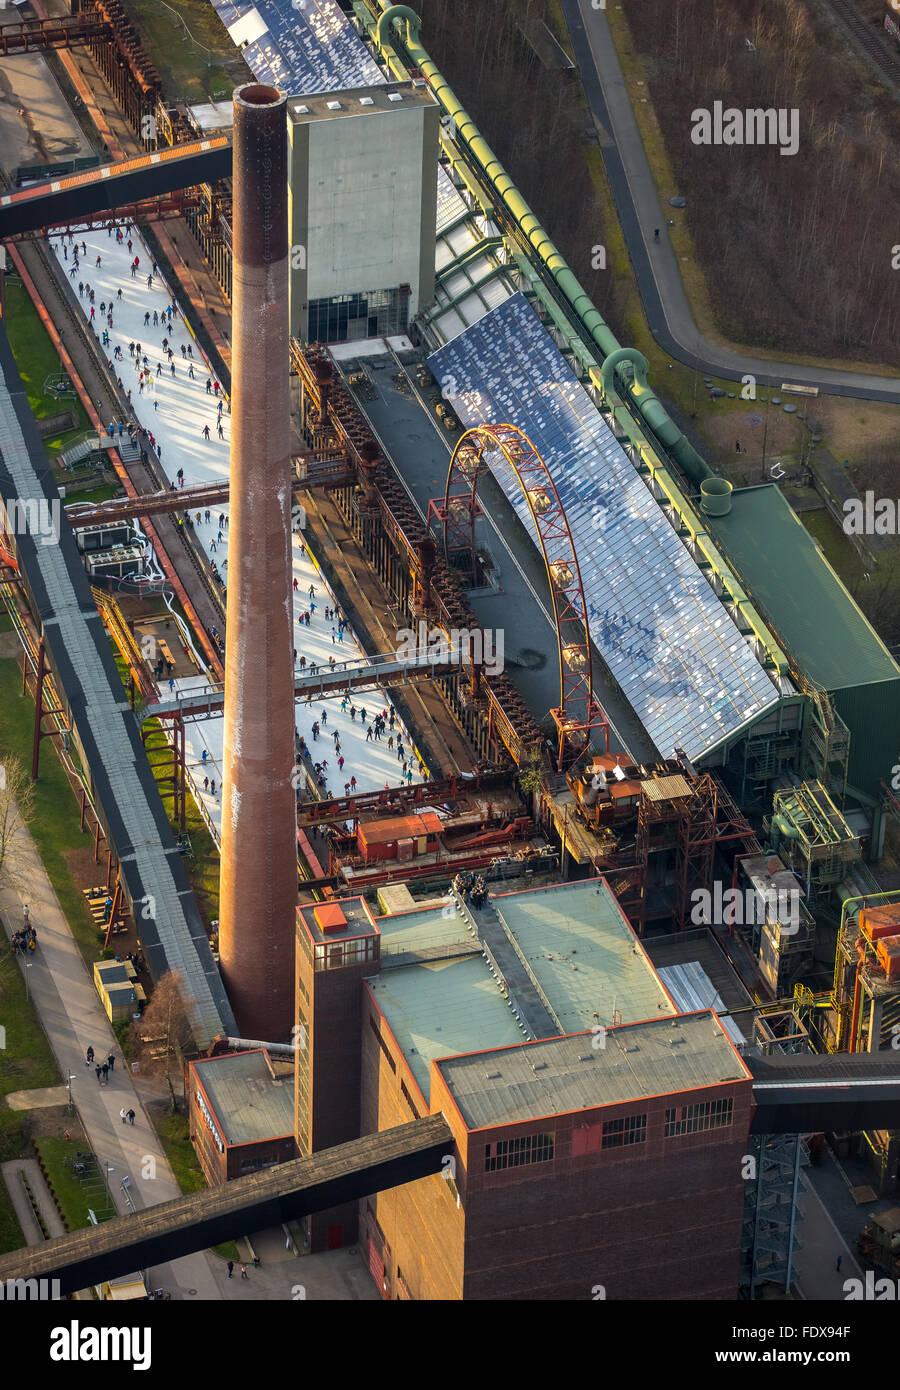 Coking plant, Zeche Zollverein, ice rink, ice skaters, industrial scene, Essen, Ruhr district, North Rhine-Westphalia, - Stock Image